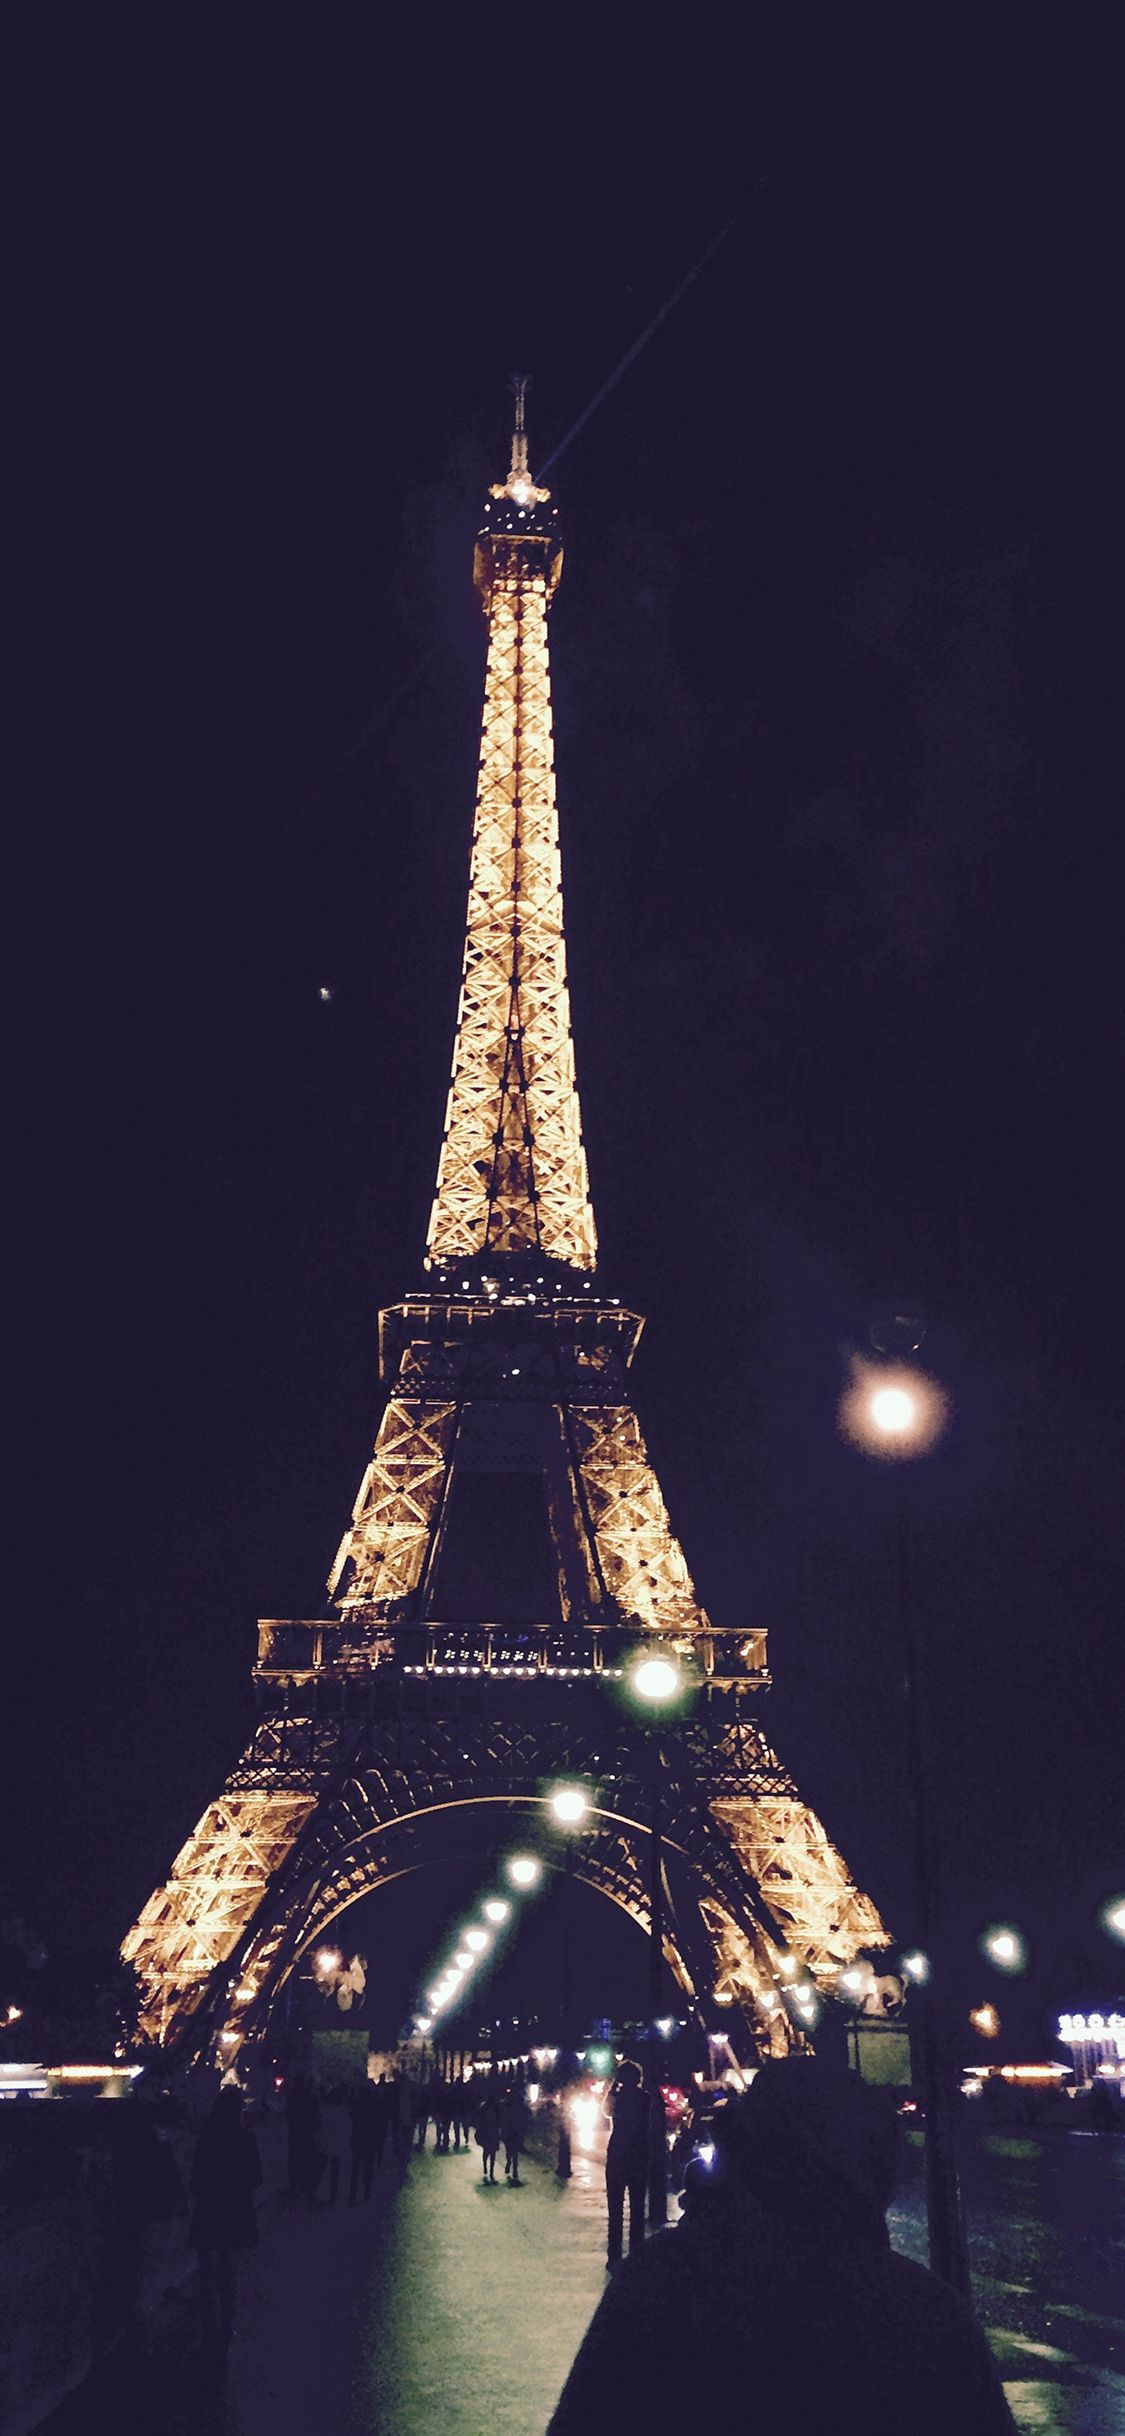 Paris Iphone Wallpapers Top Free Paris Iphone Backgrounds